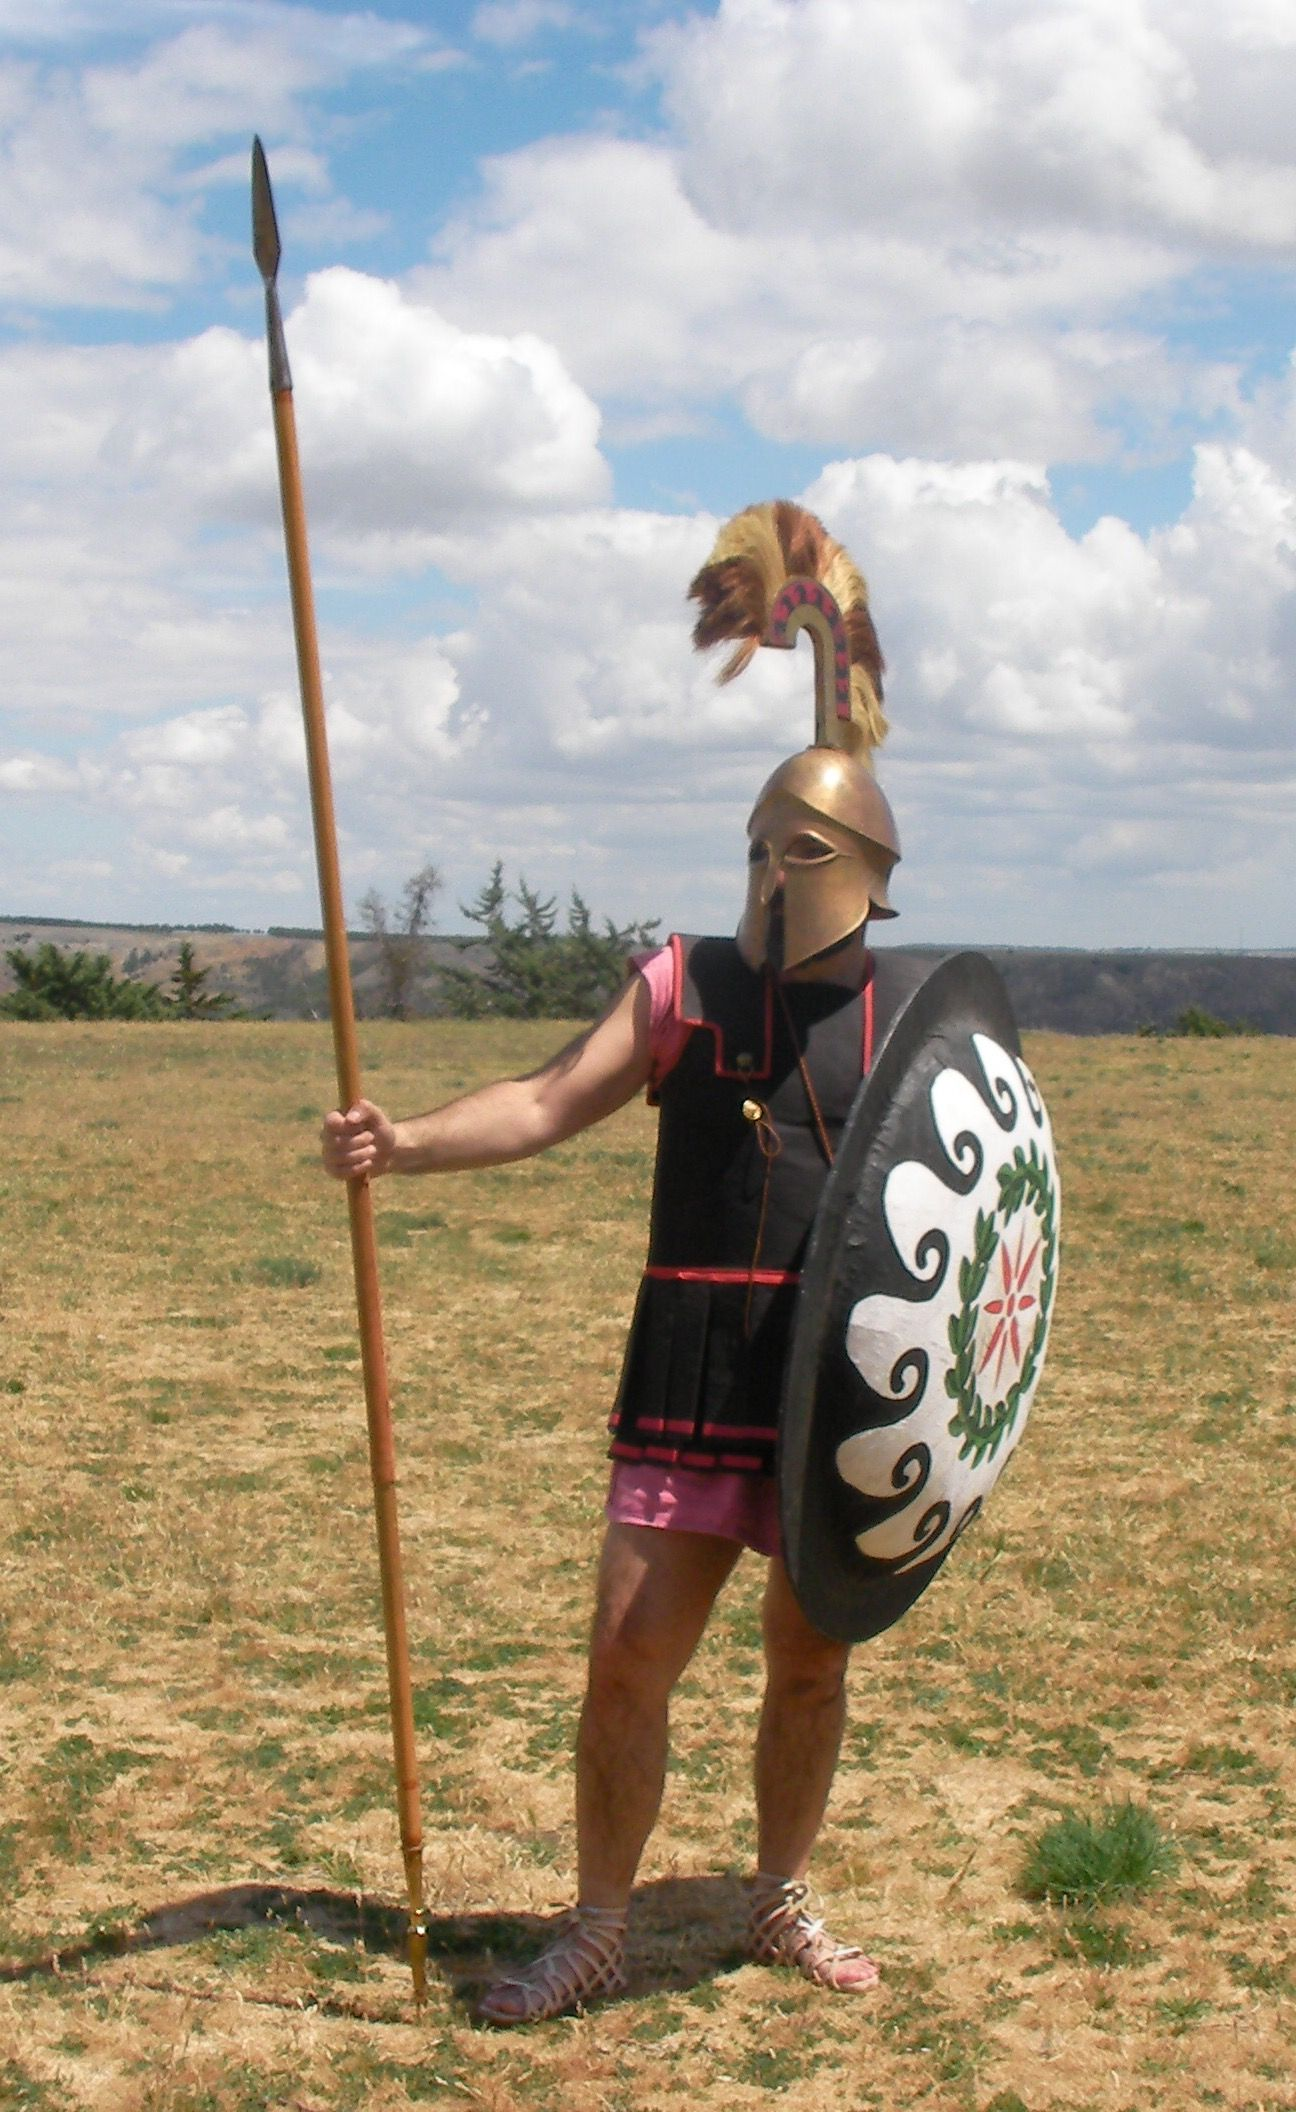 Hoplita Griego Greek Hoplite Guerrero Warrior & Hoplita Griego Greek Hoplite Guerrero Warrior | Armor/Clothing ...